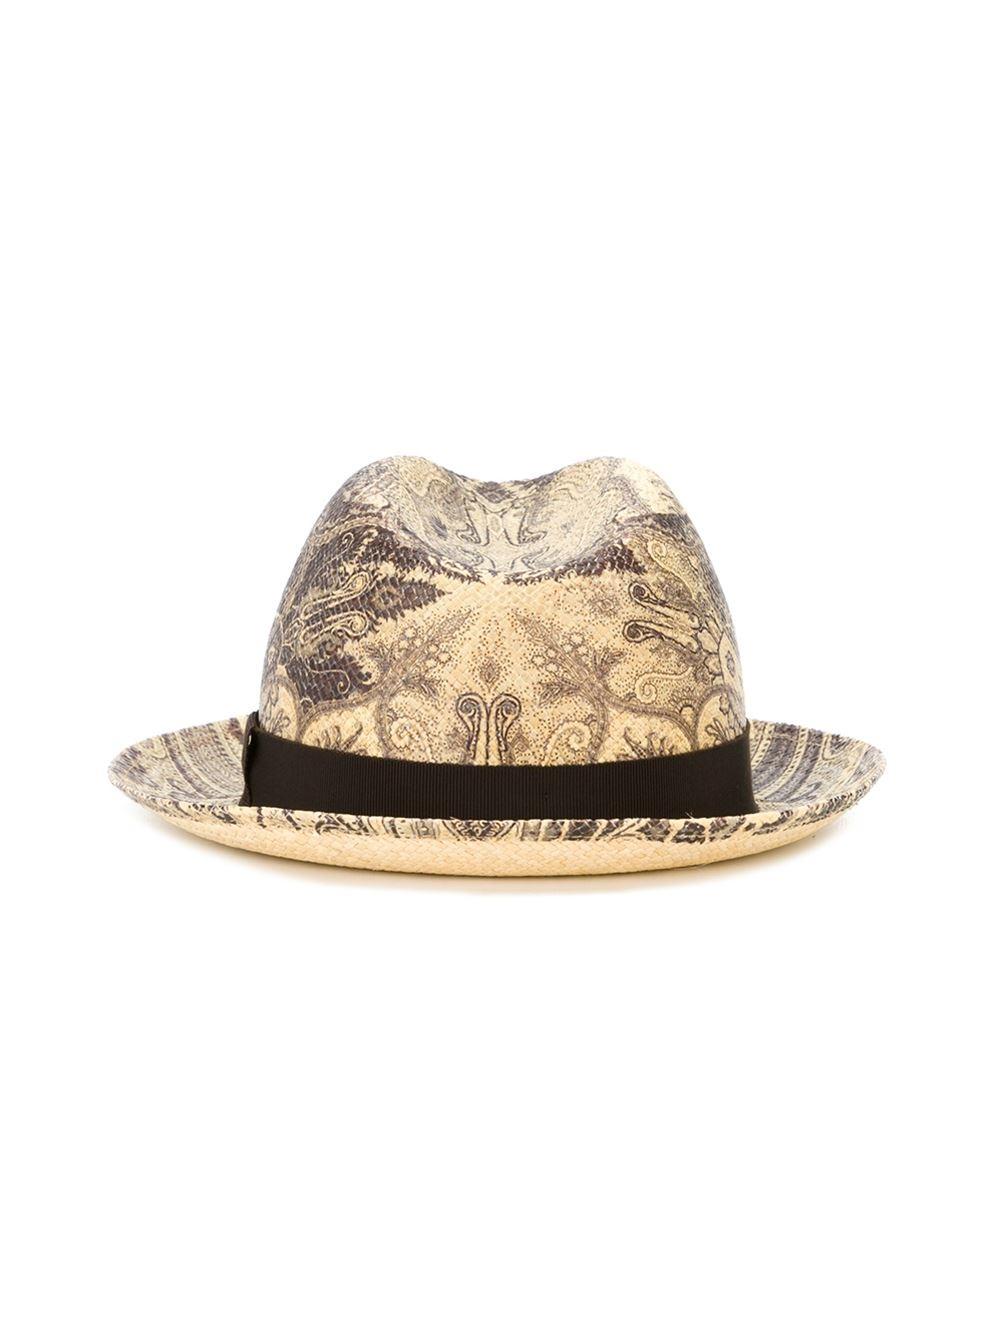 Lyst - Etro Paisley Pattern Hat In Black For Men-9745